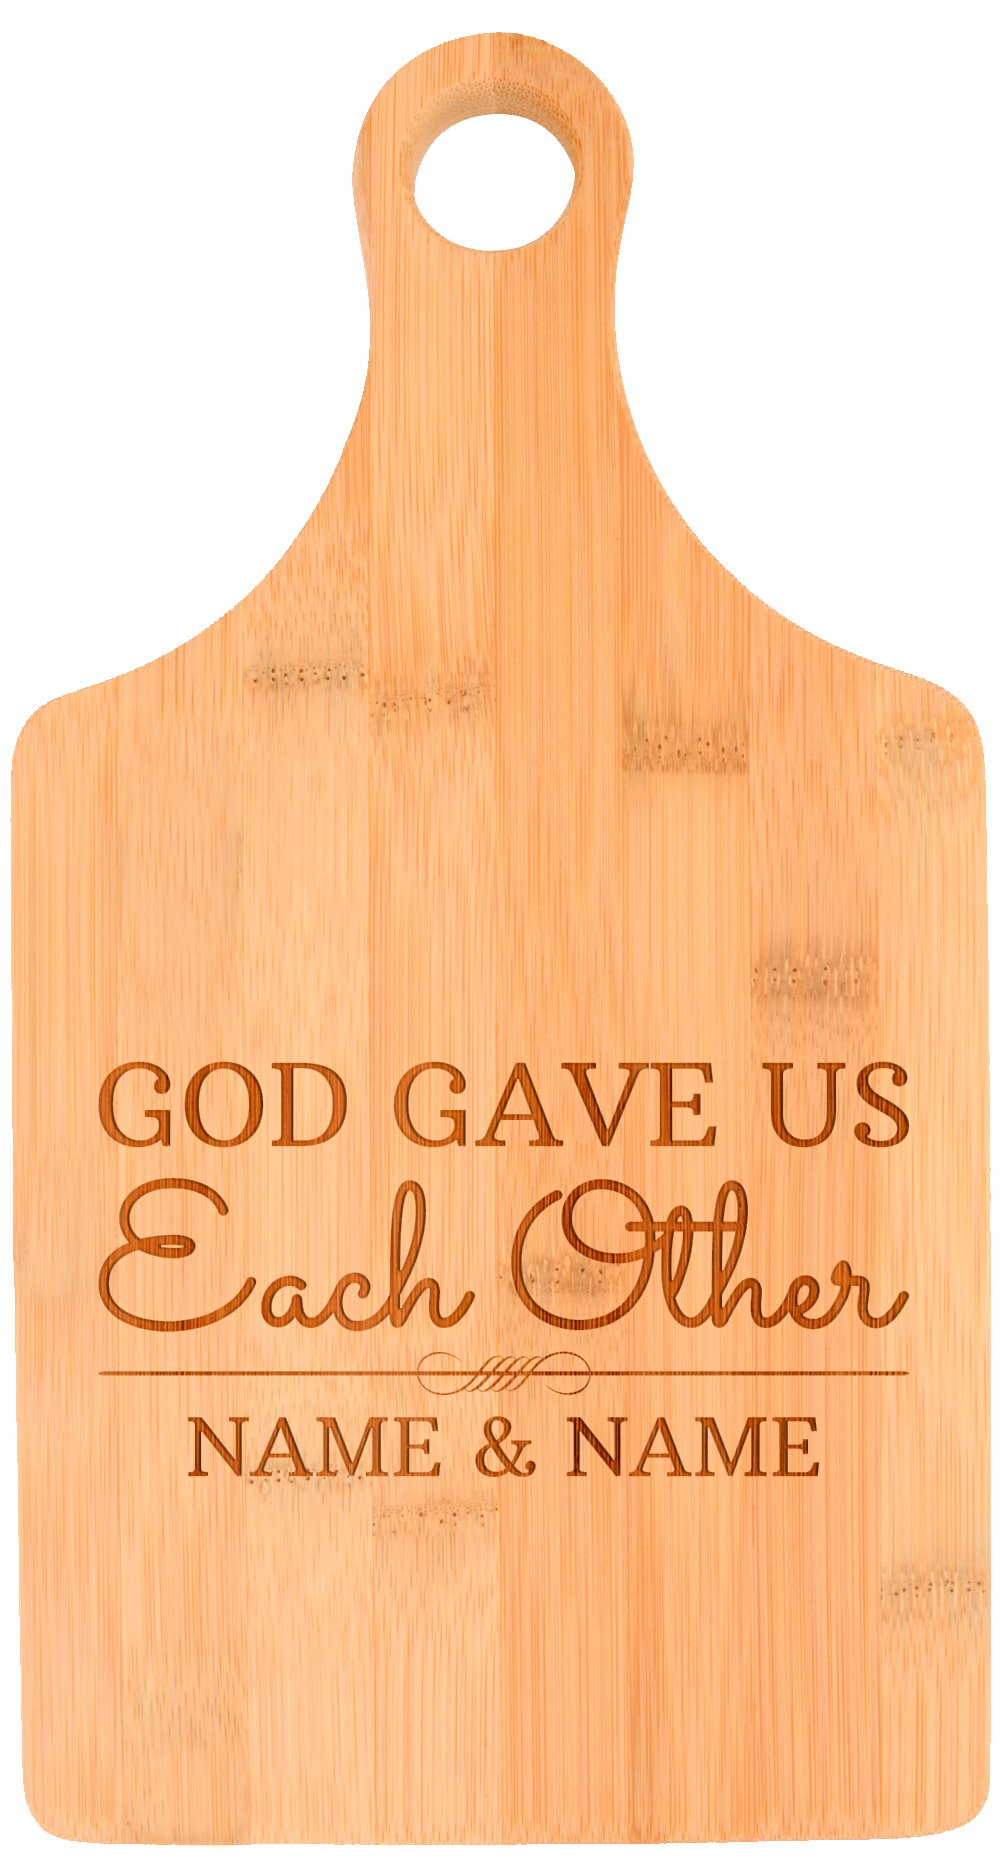 Custom Wedding Gift Christian God Gave Us Eachother Personalized Paddle Shaped Bamboo Cutting Board